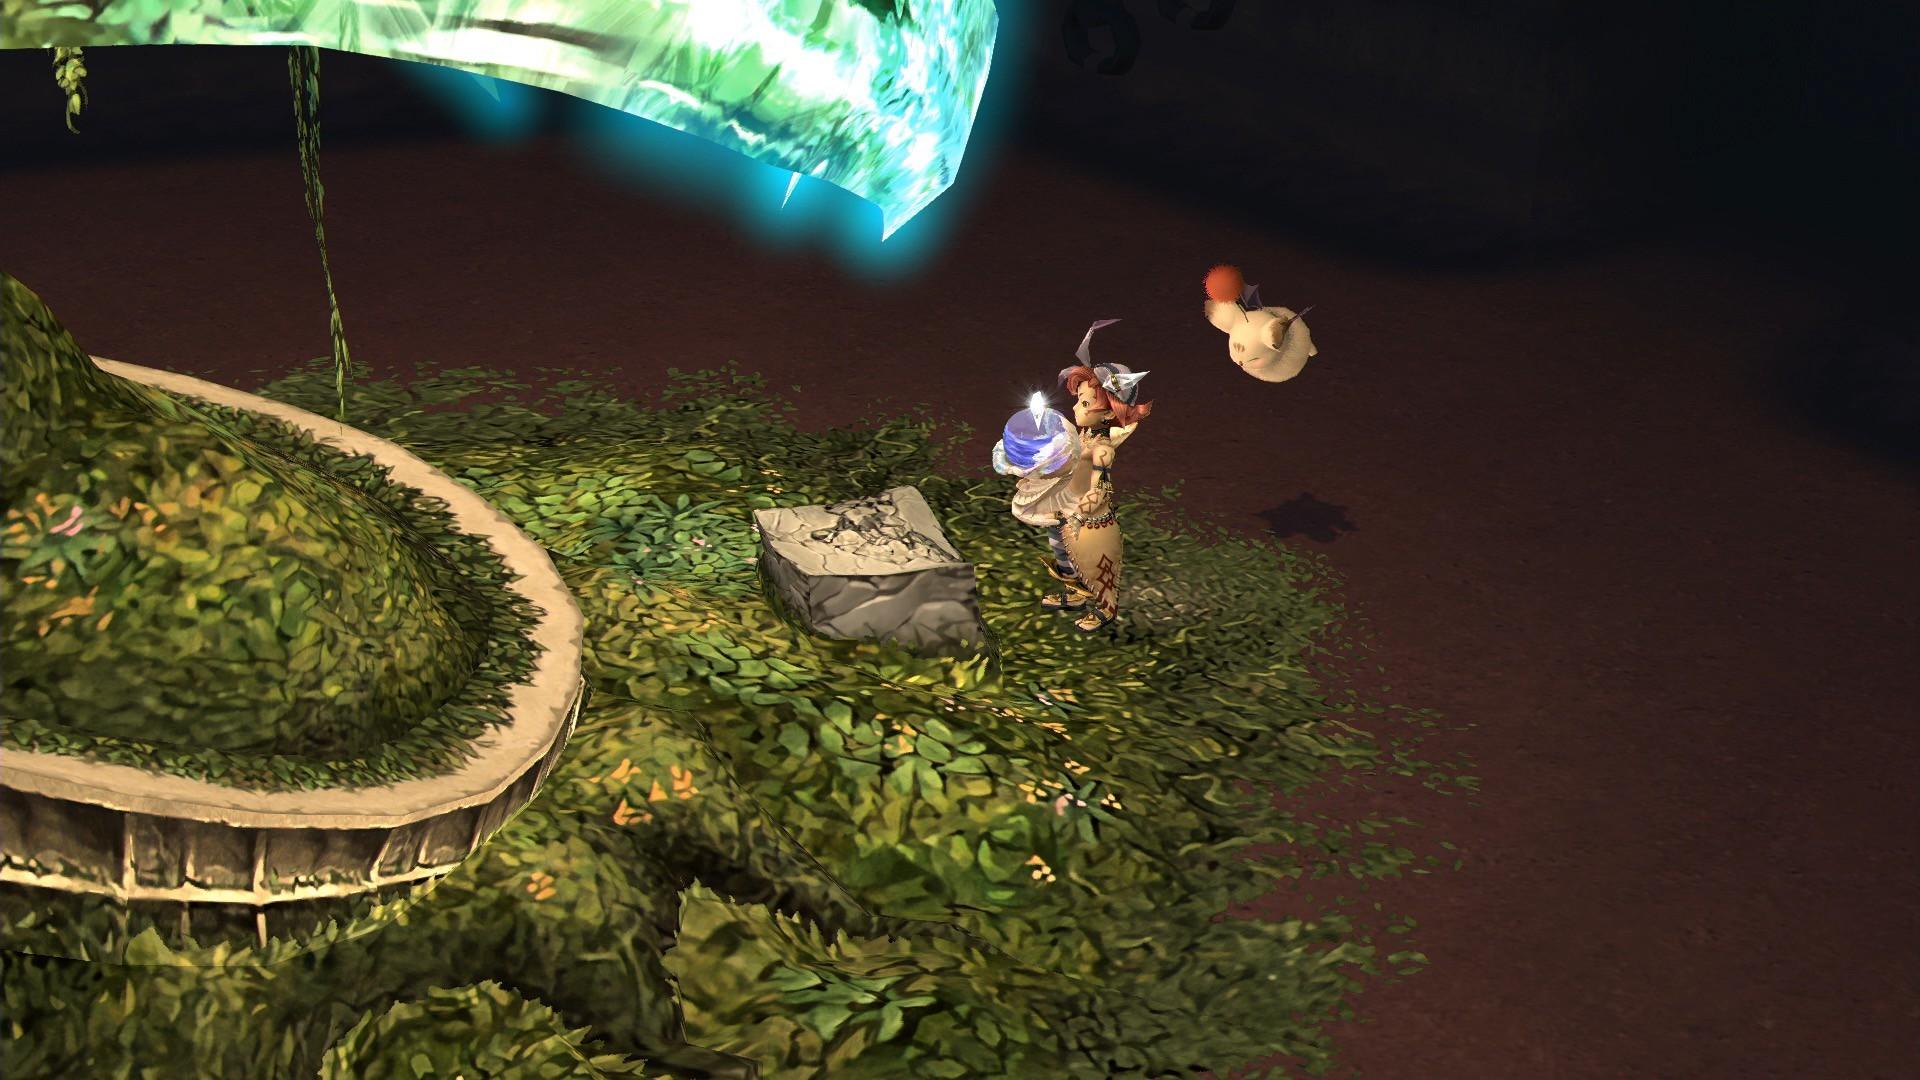 Ремастер Final Fantasy Crystal Chronicles выйдет на Западе27 августа